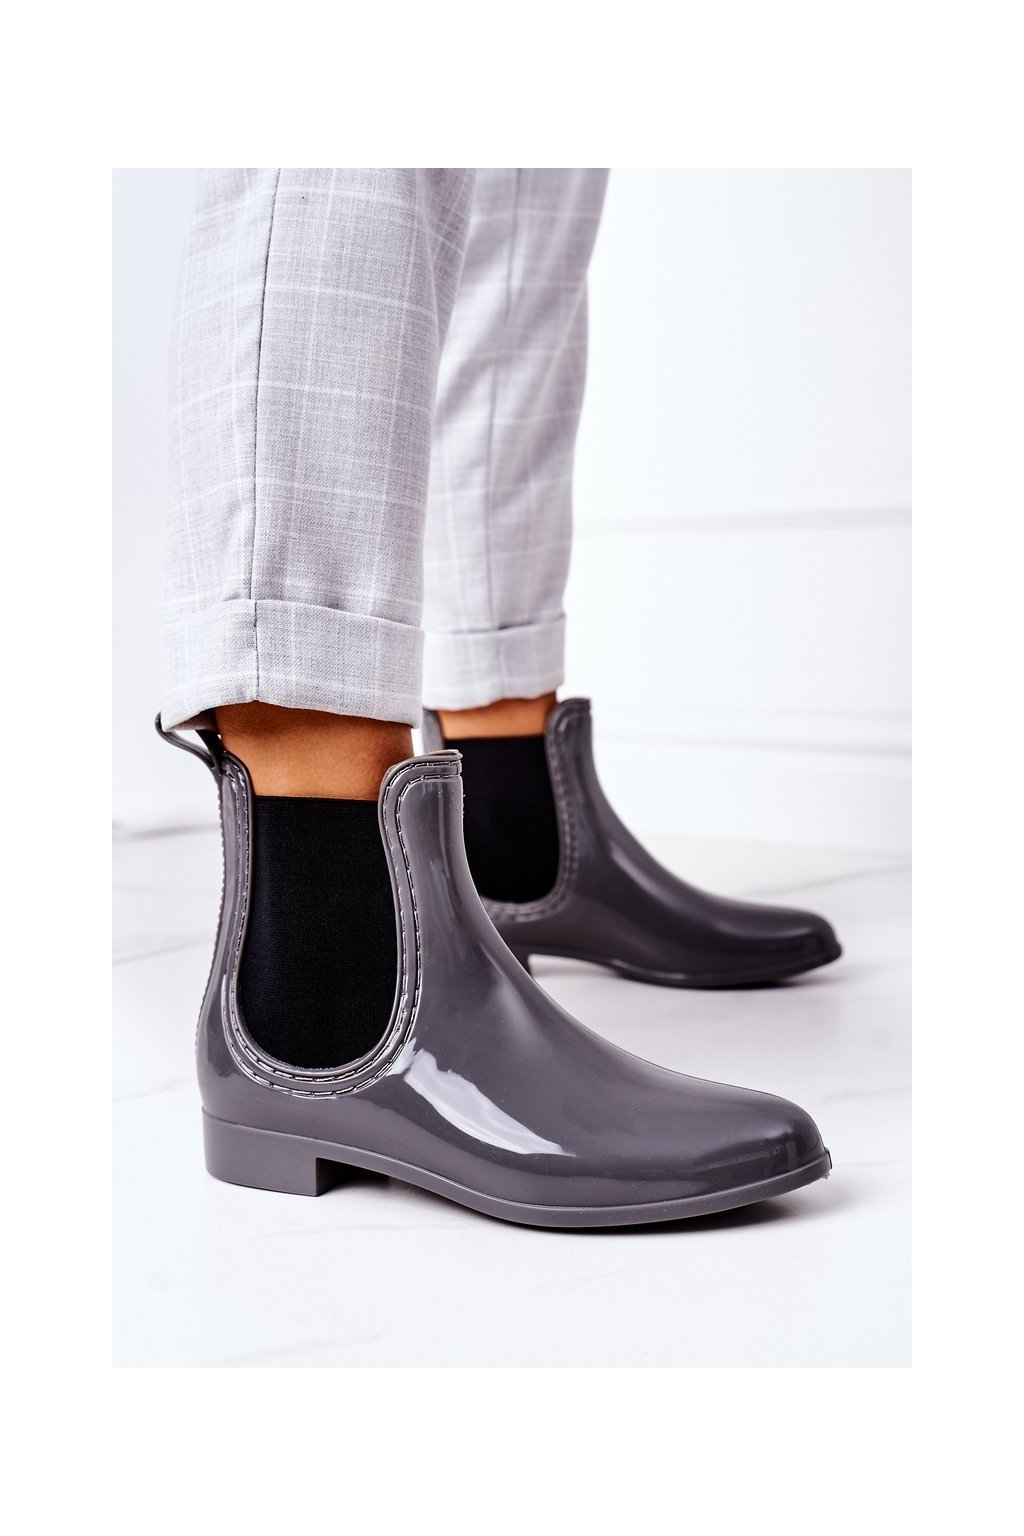 Dámske gumáky farba sivá kód obuvi HMY-9 GREY